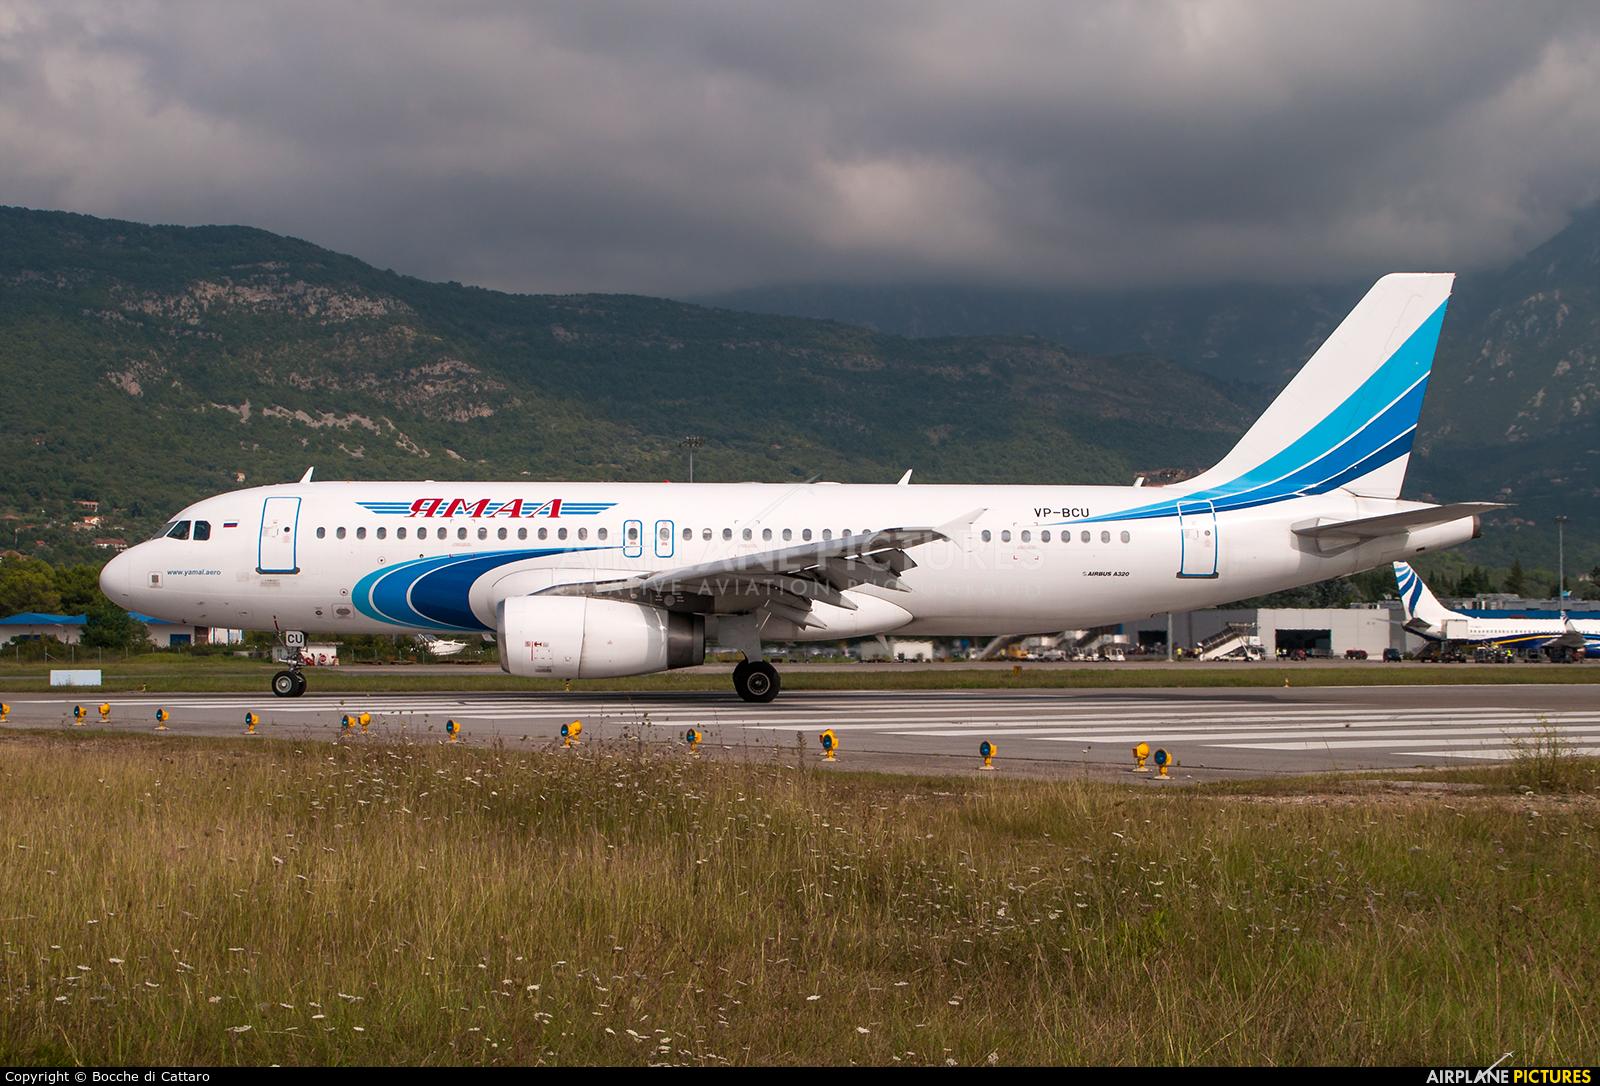 Yamal Airlines VP-BCU aircraft at Tivat